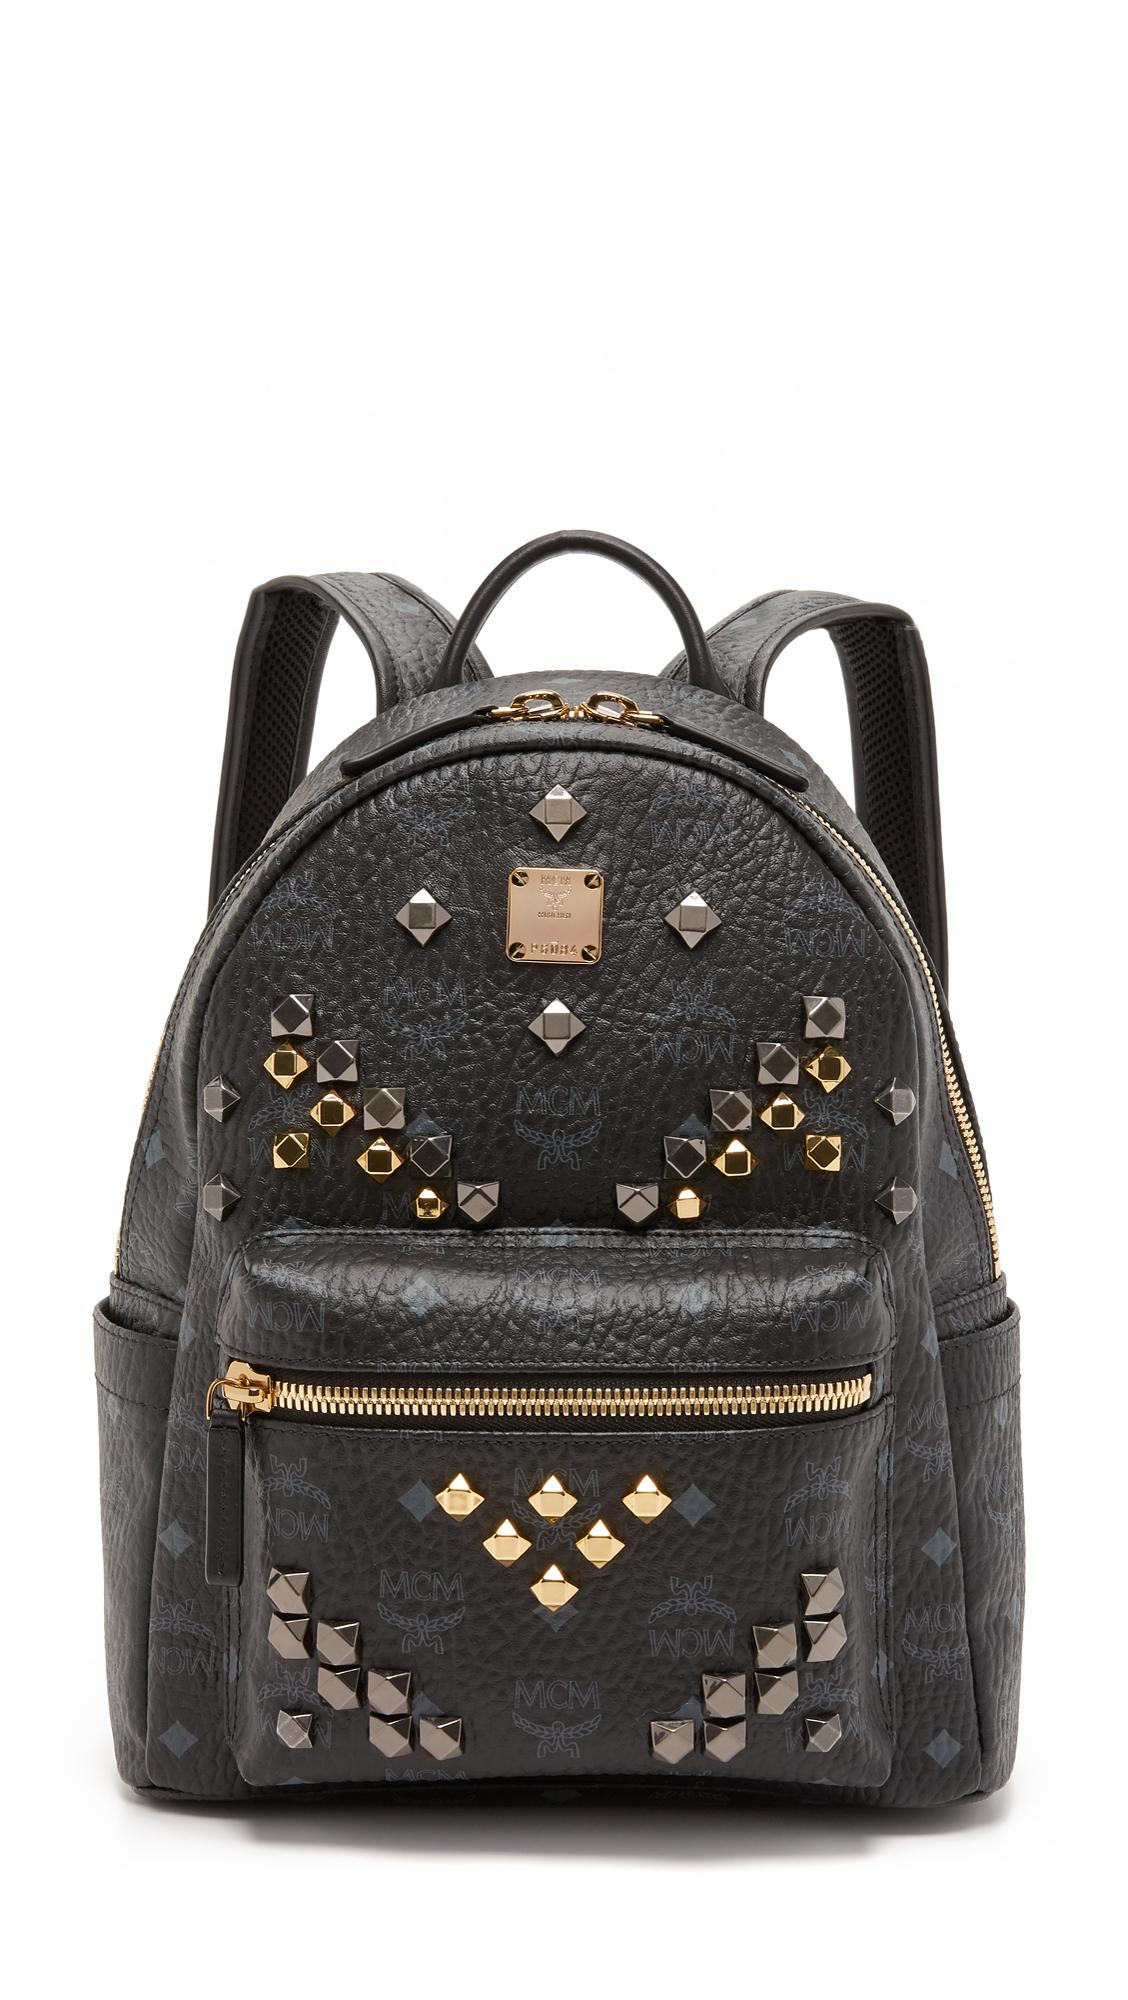 Mcm M Stud Small Stark Backpack In Black Lyst